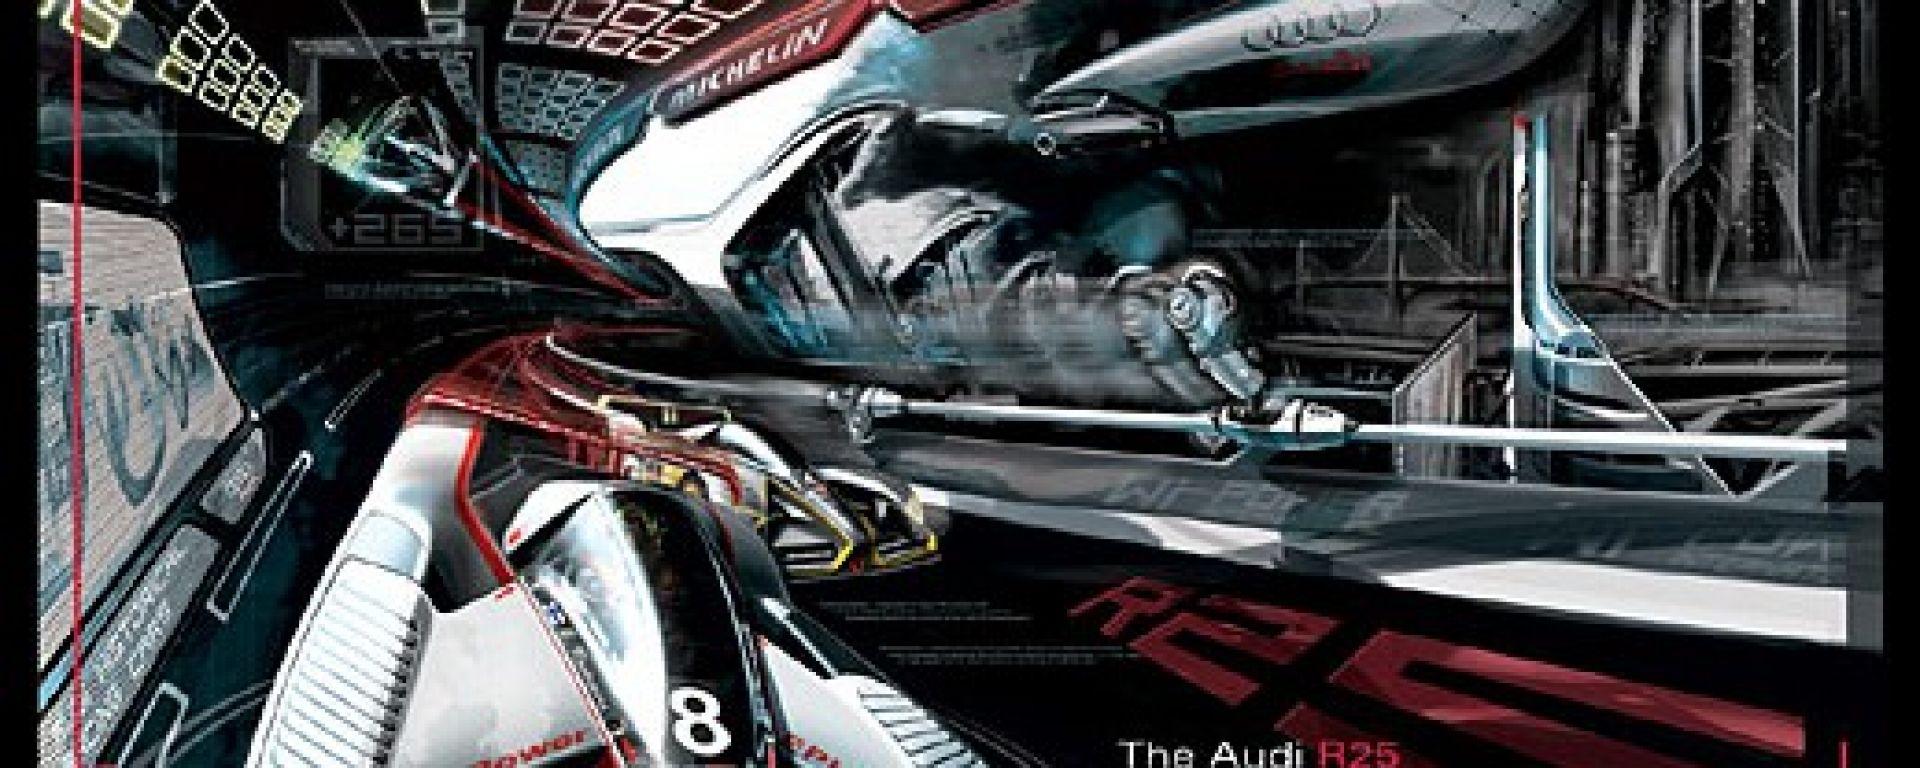 Motor Sports 2025: Audi R25